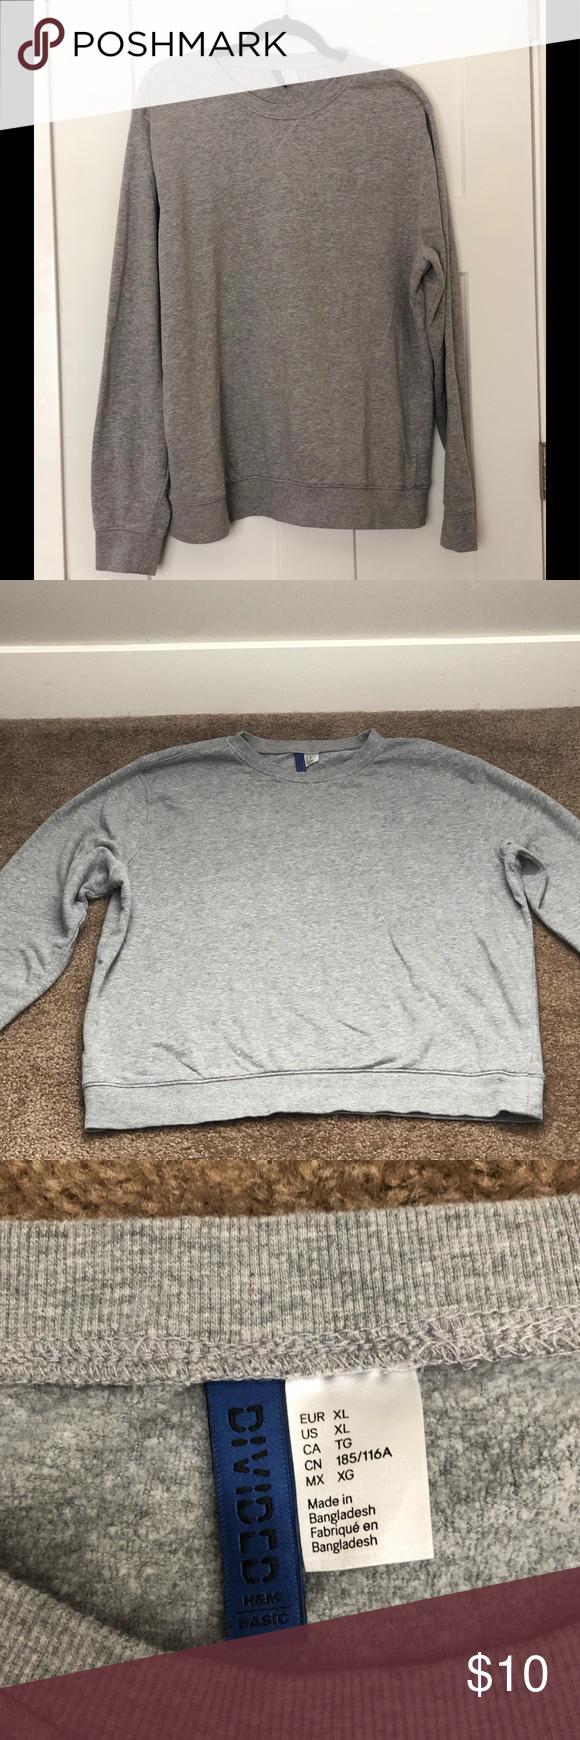 Divided By H M Men S Sweatshirt H M Men Sweatshirts Divide Shirts [ 1740 x 580 Pixel ]